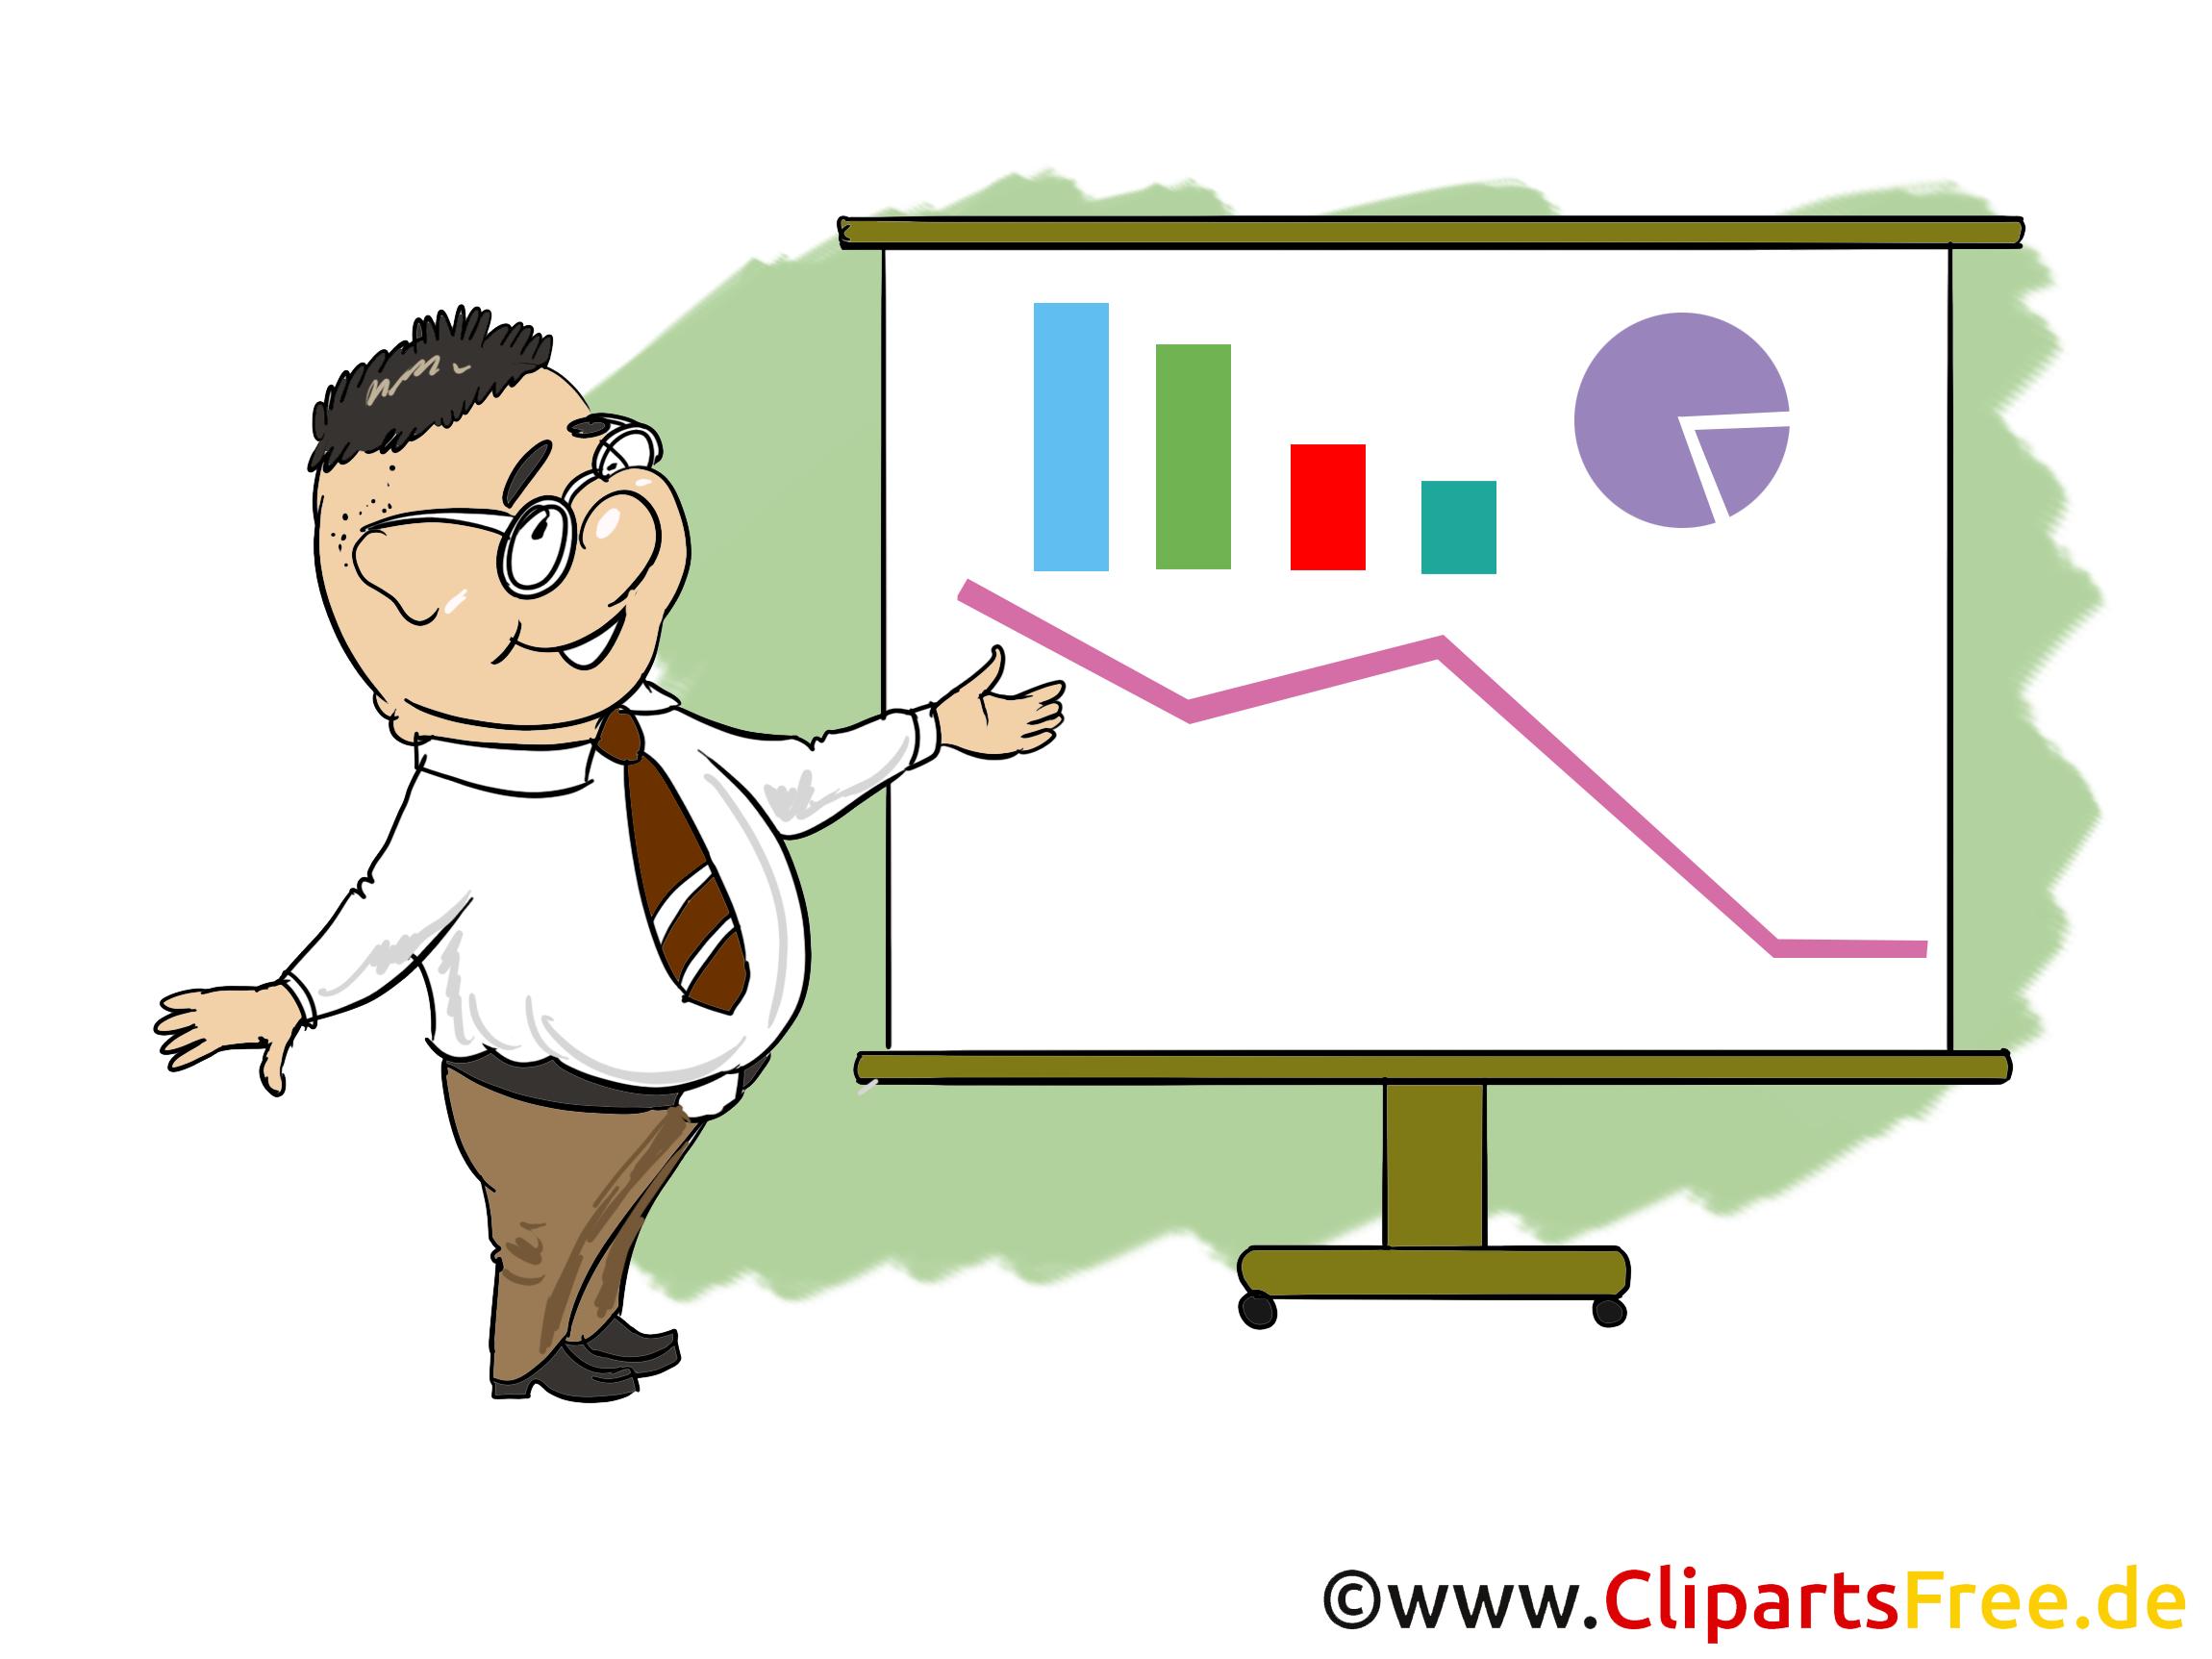 Steuerberater Bild, Clipart, Grafik, Cartoon, Illustration